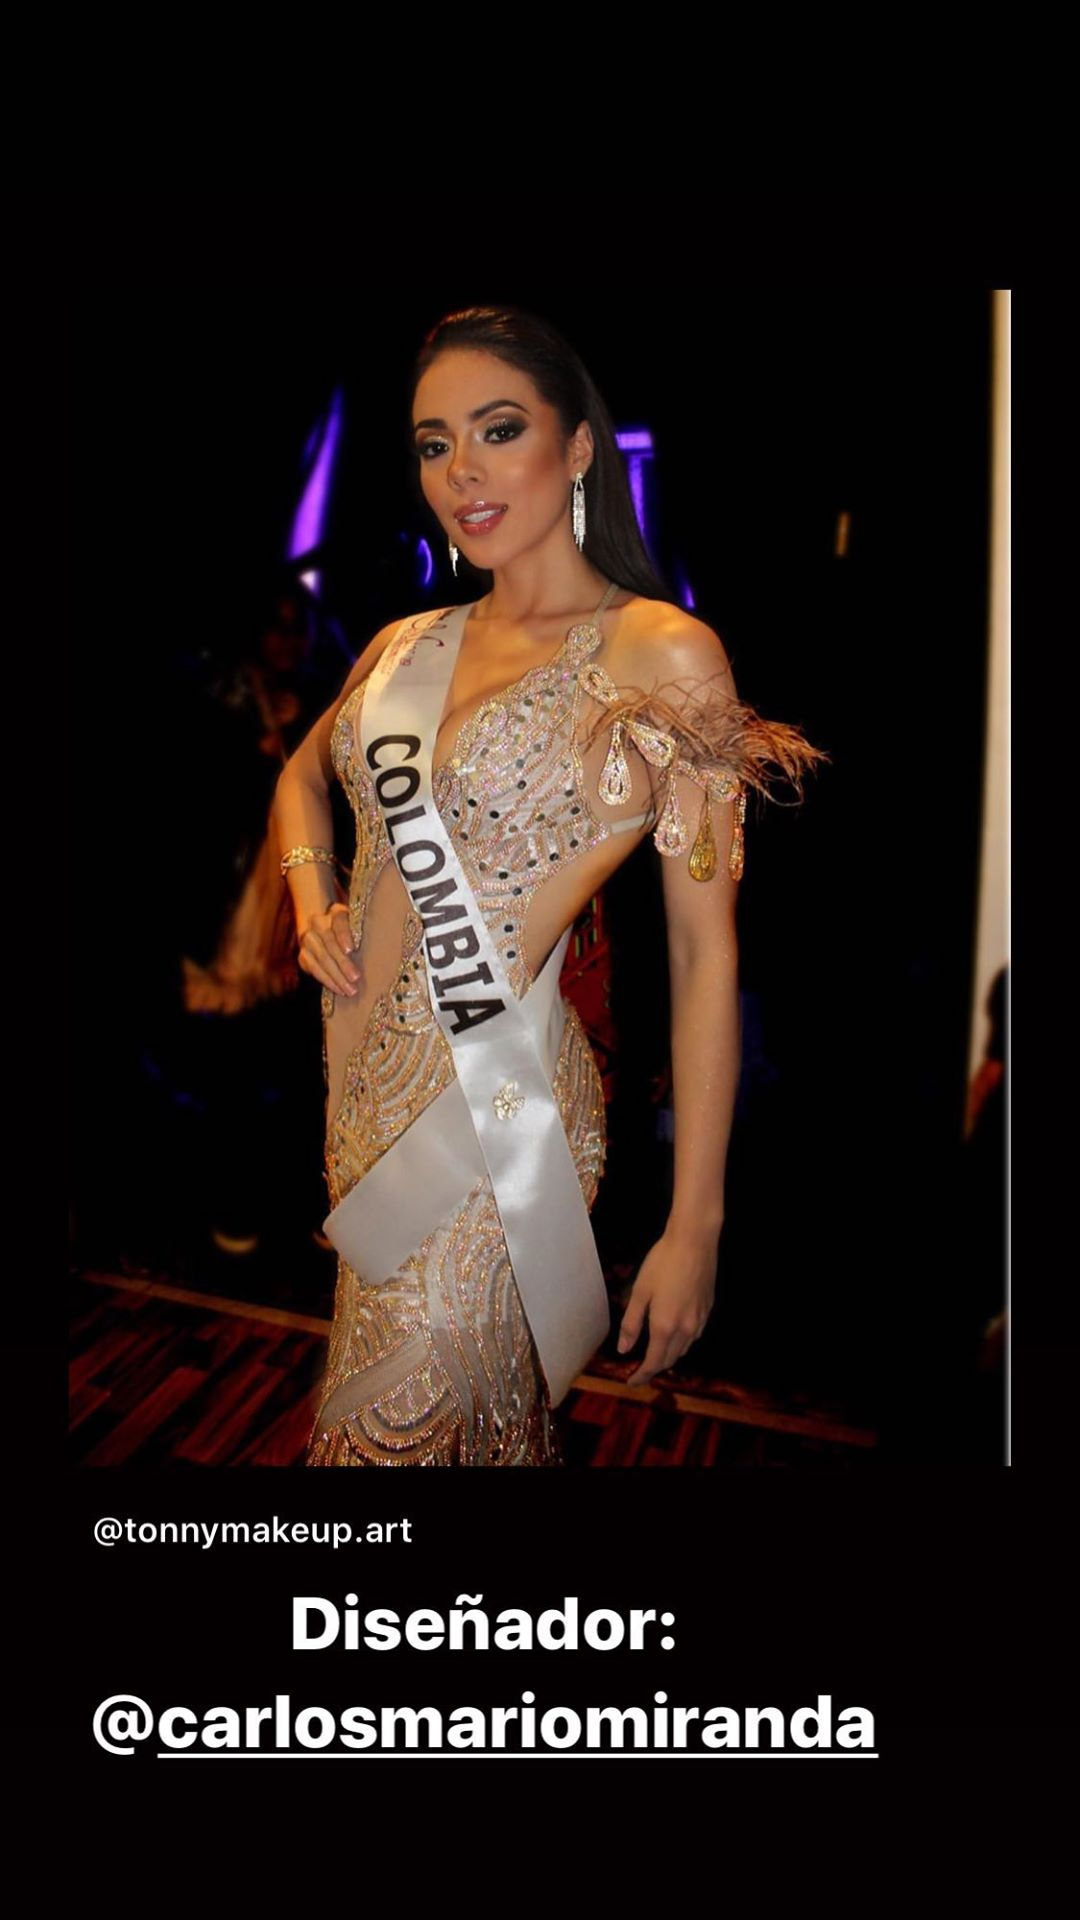 gina aguirre, virreyna de miss latinoamerica 2019. - Página 6 69714510